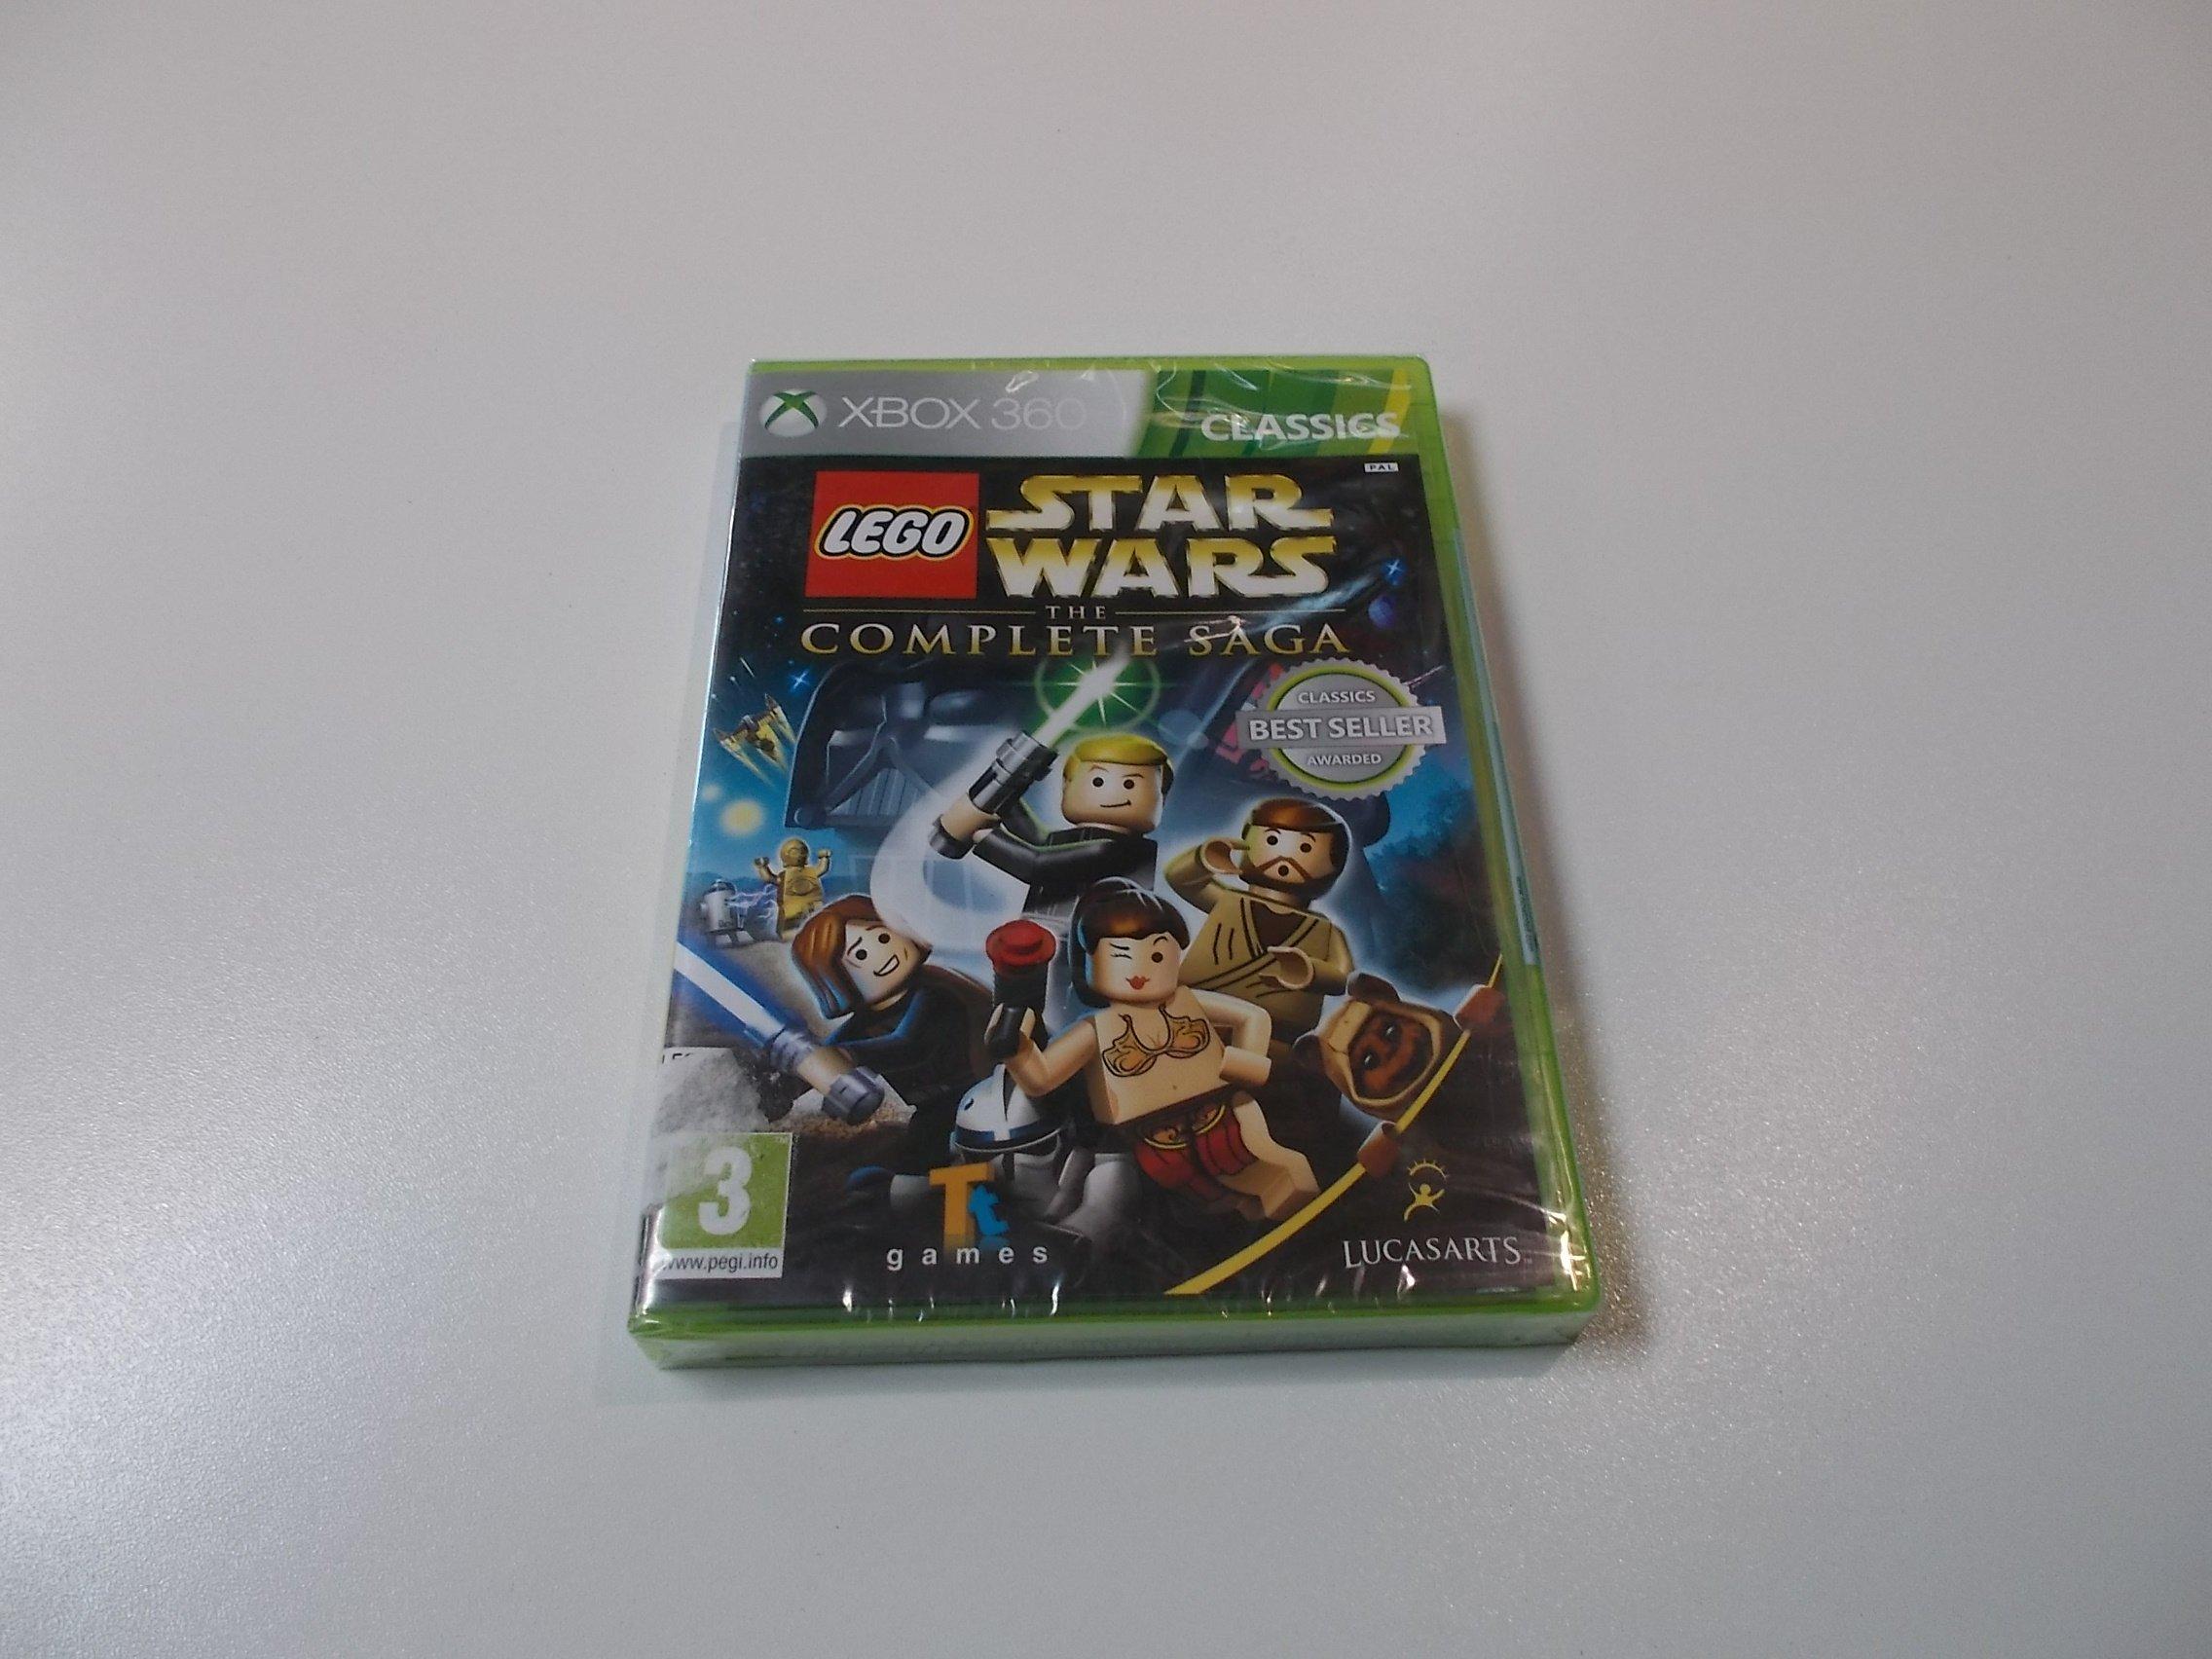 LEGO Star Wars The Complete Saga - GRA Xbox 360 - Opole 0418